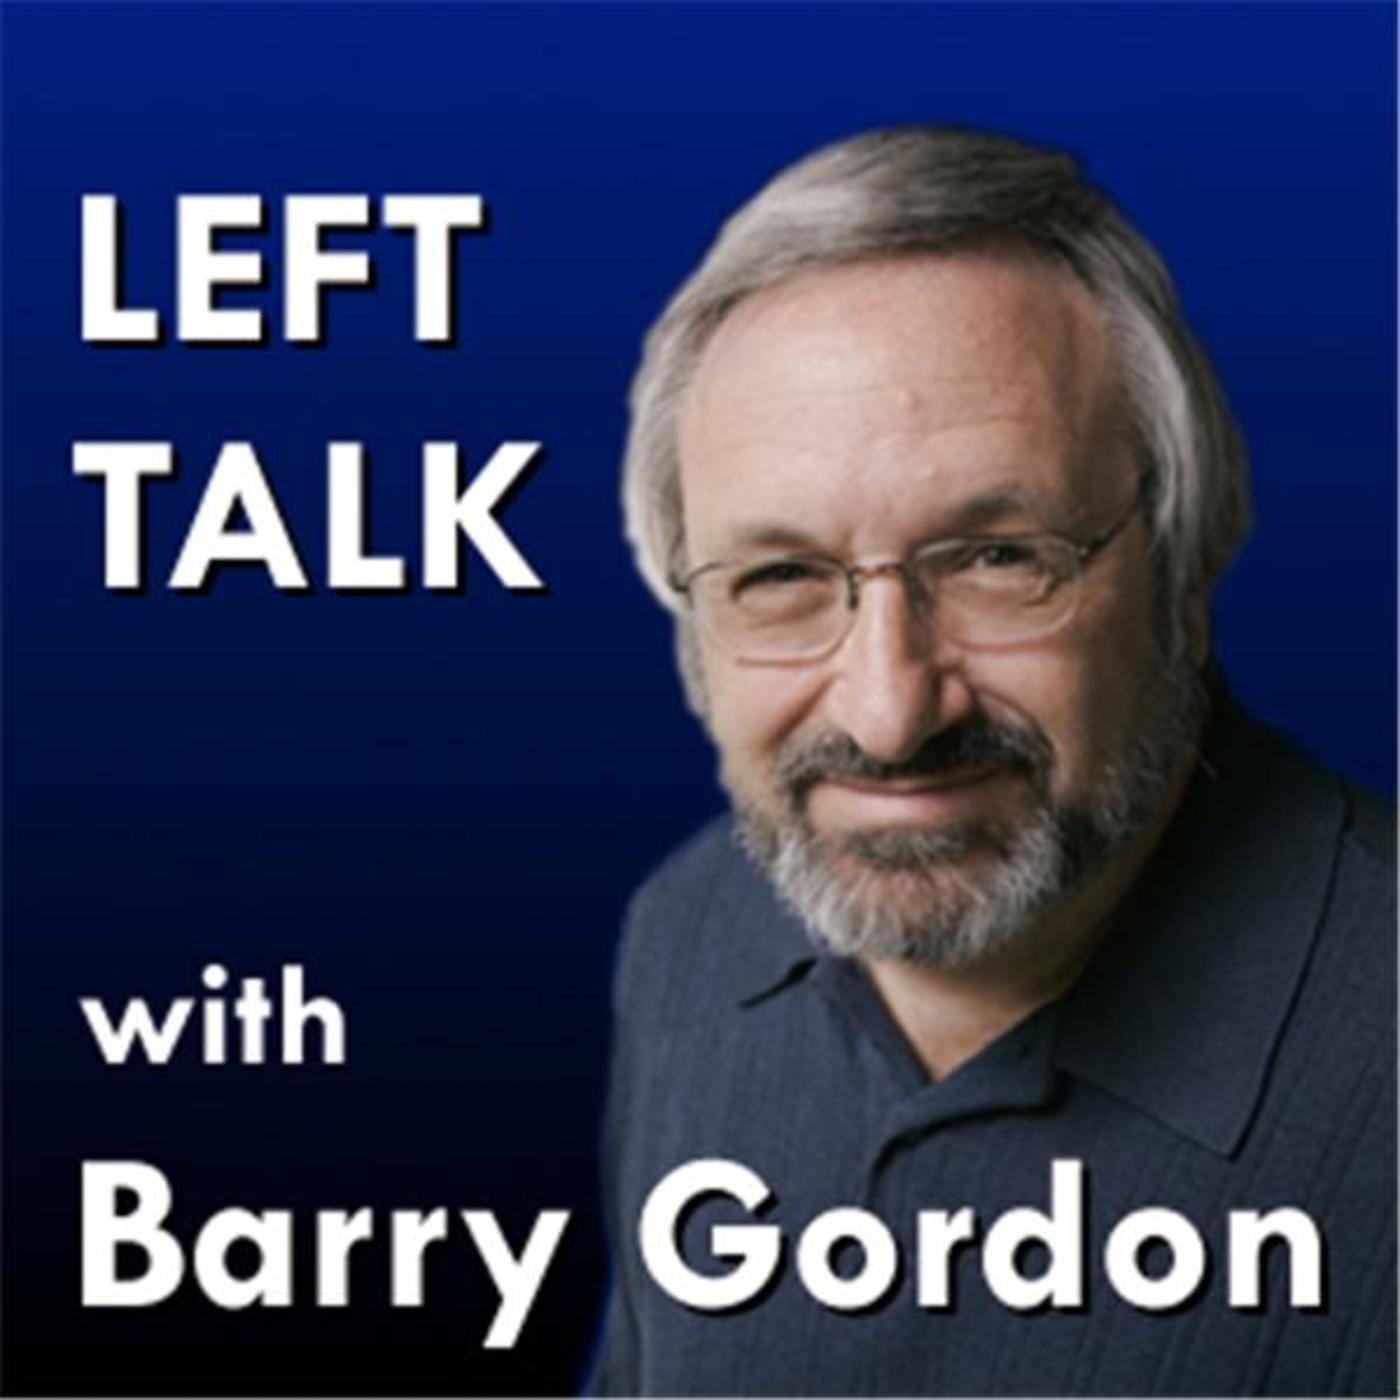 Left Talk with Barry Gordon